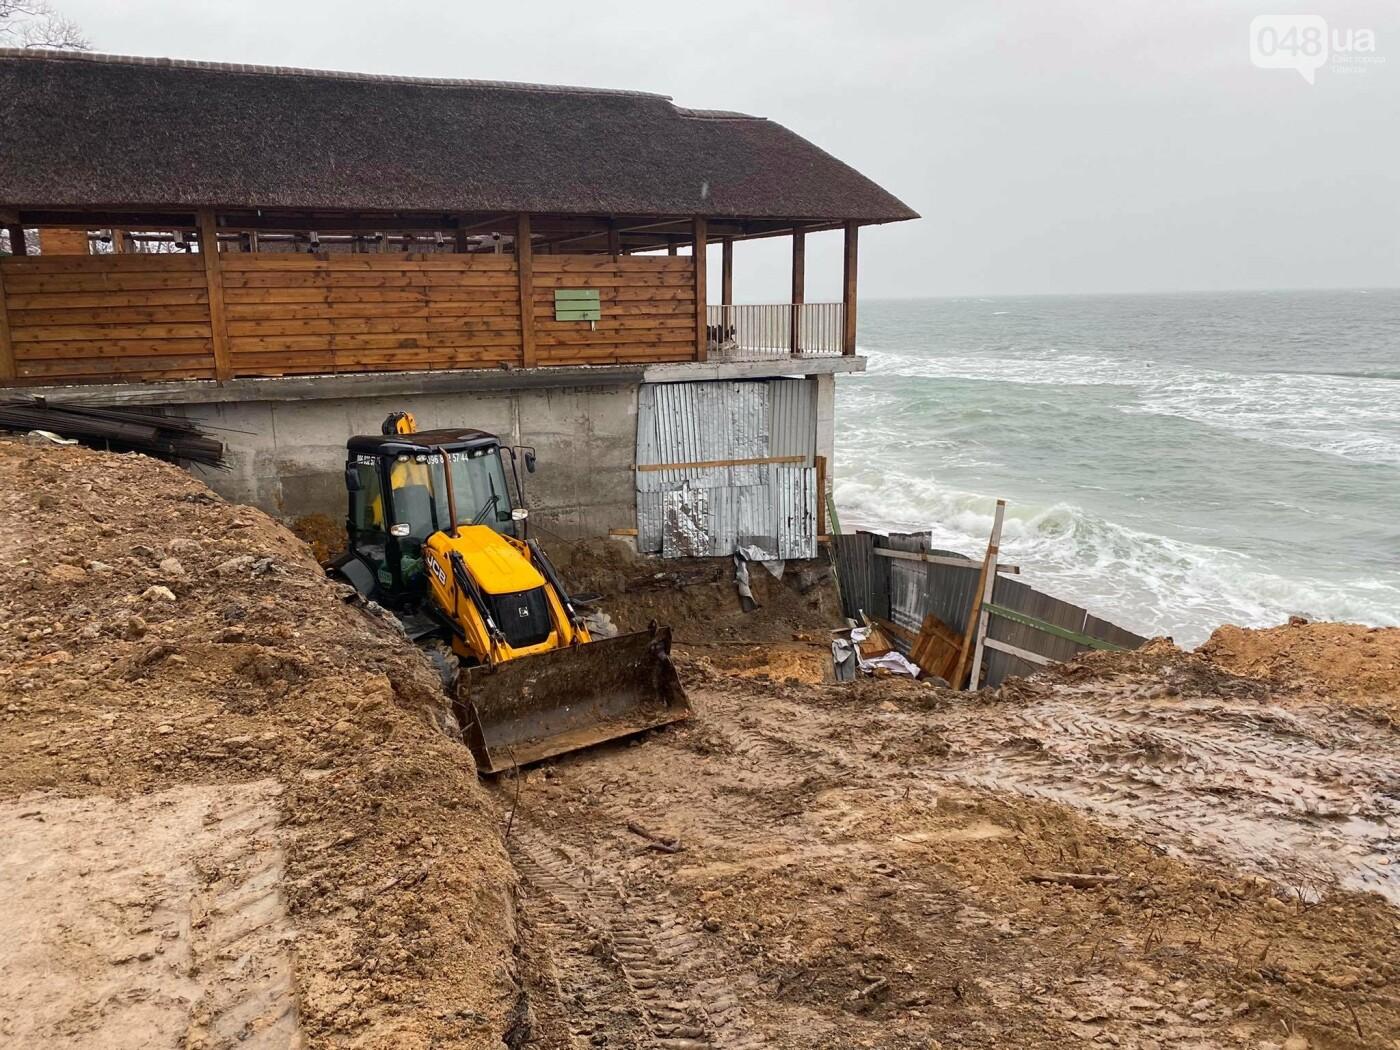 В Аркадии на побережье активист нашел незаконную стройку,- ФОТО, ВИДЕО, фото-4